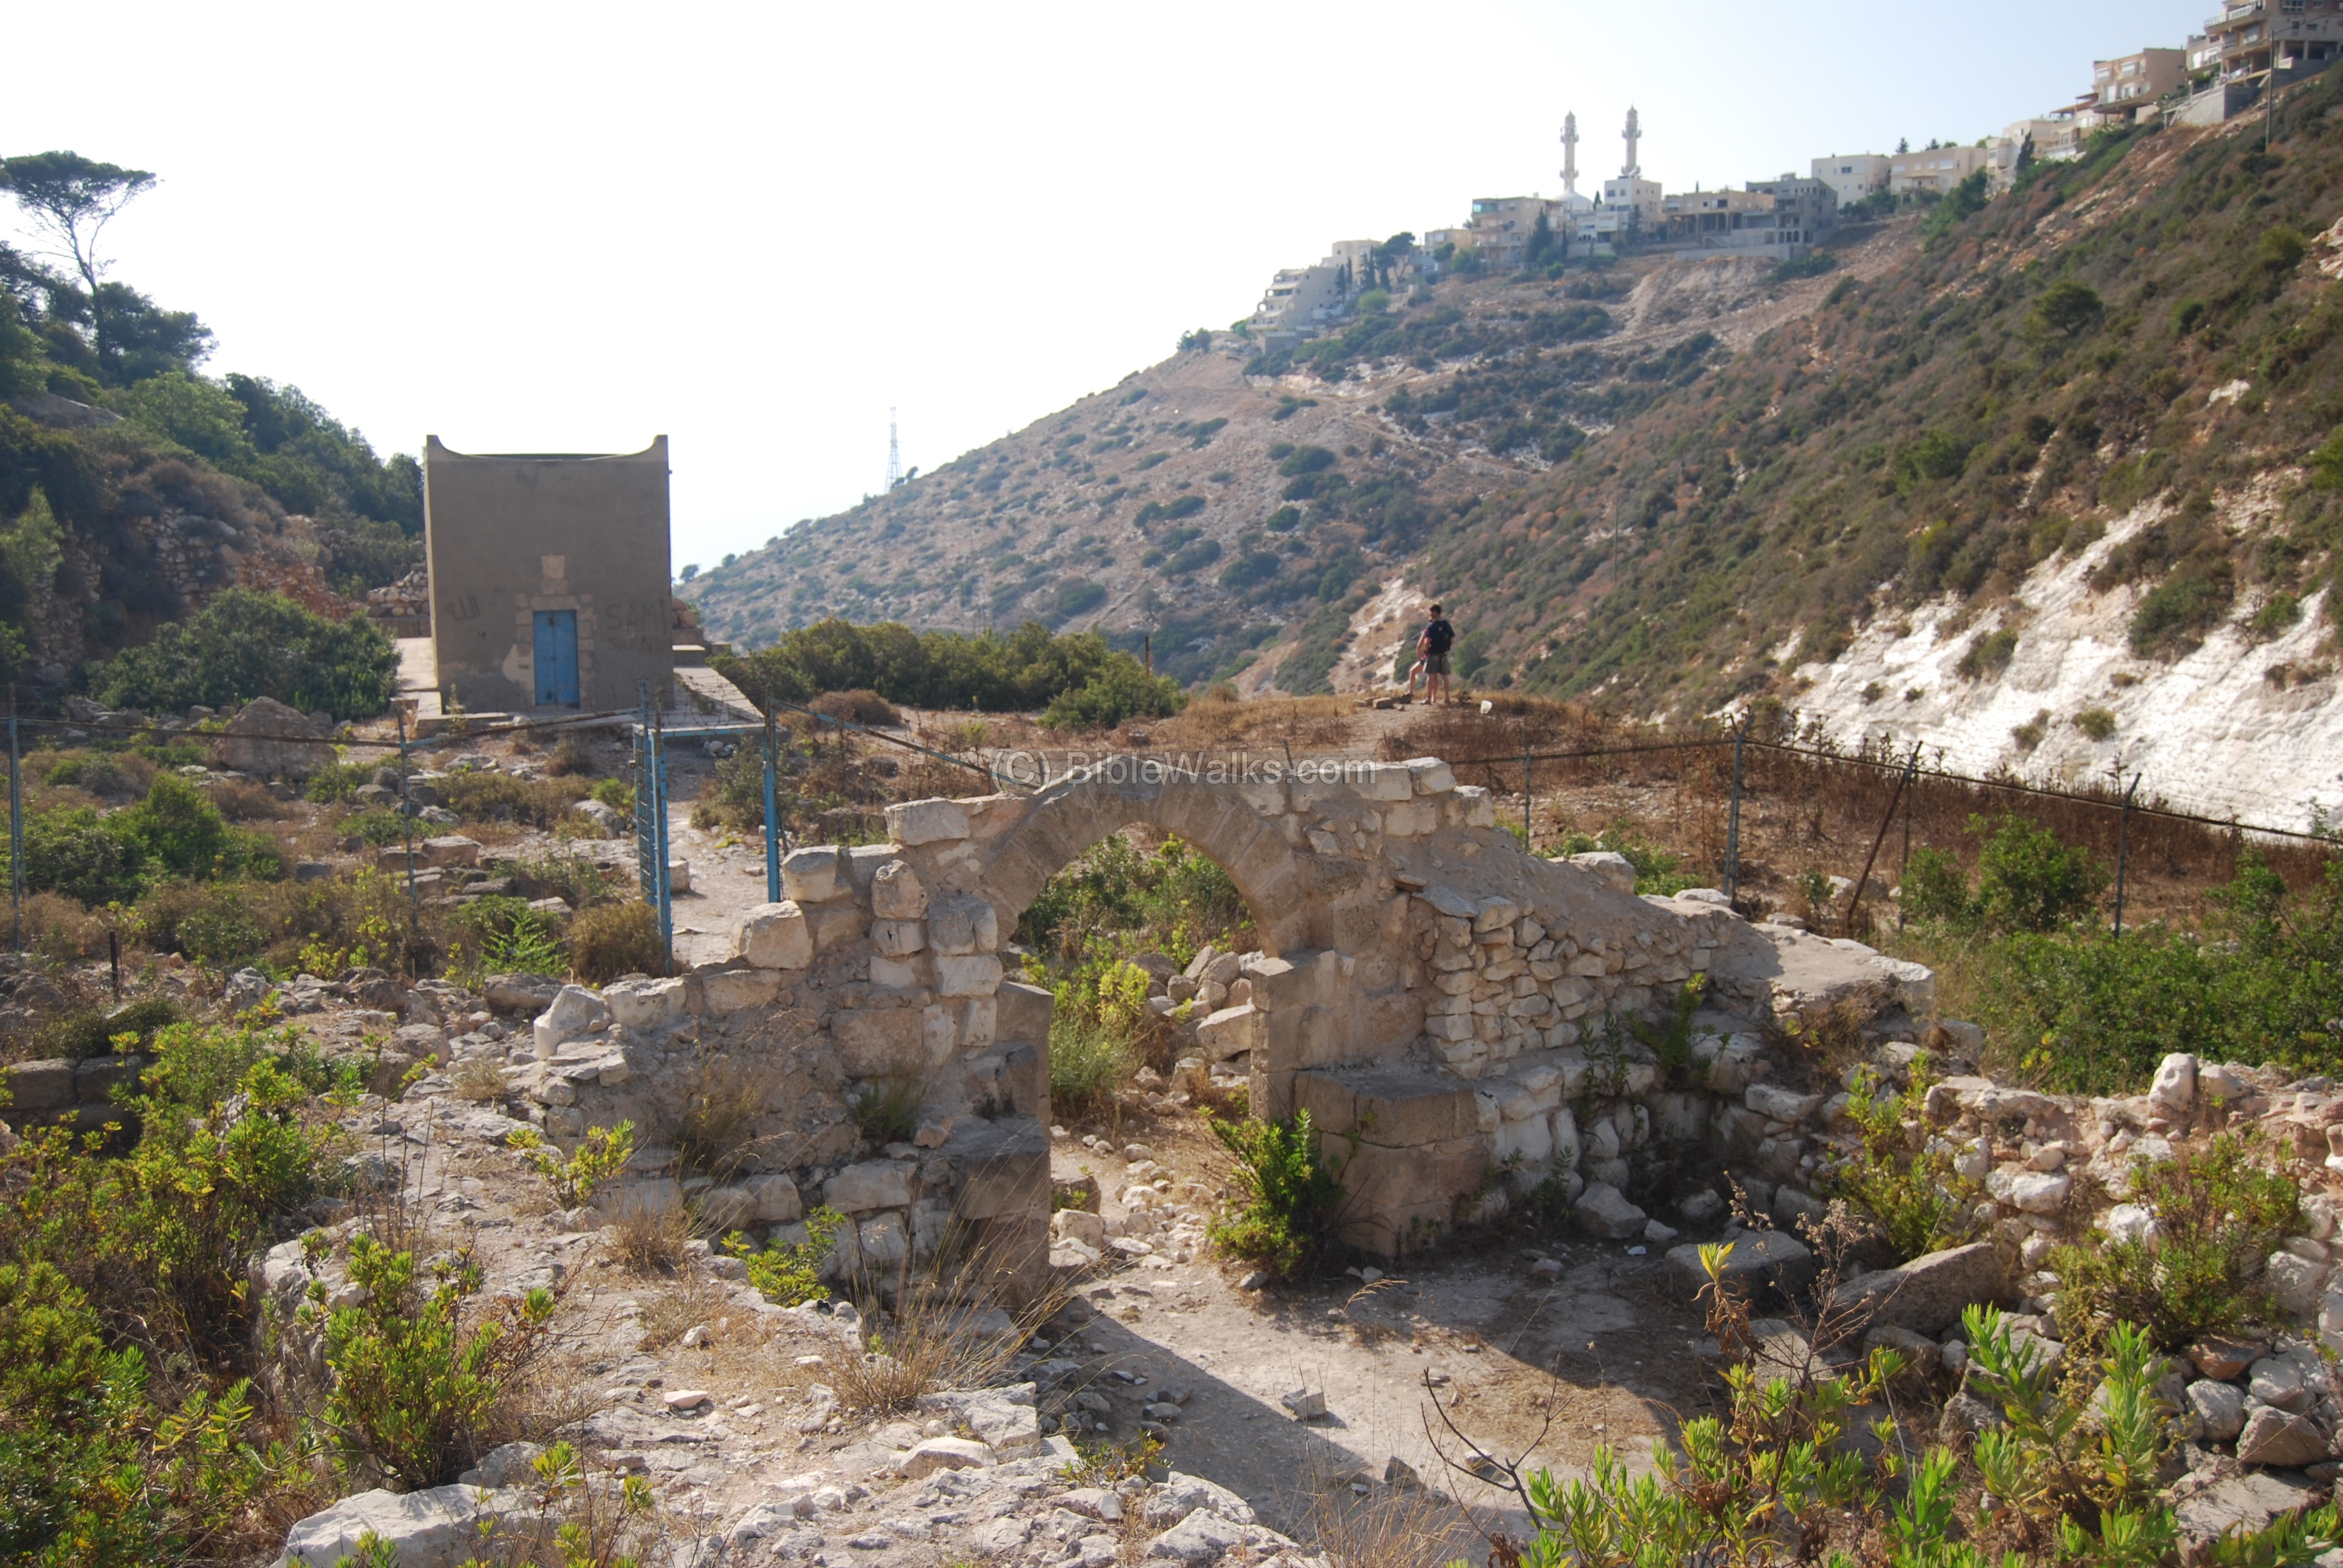 Siah brook - ruins of a Carmelite Monastery